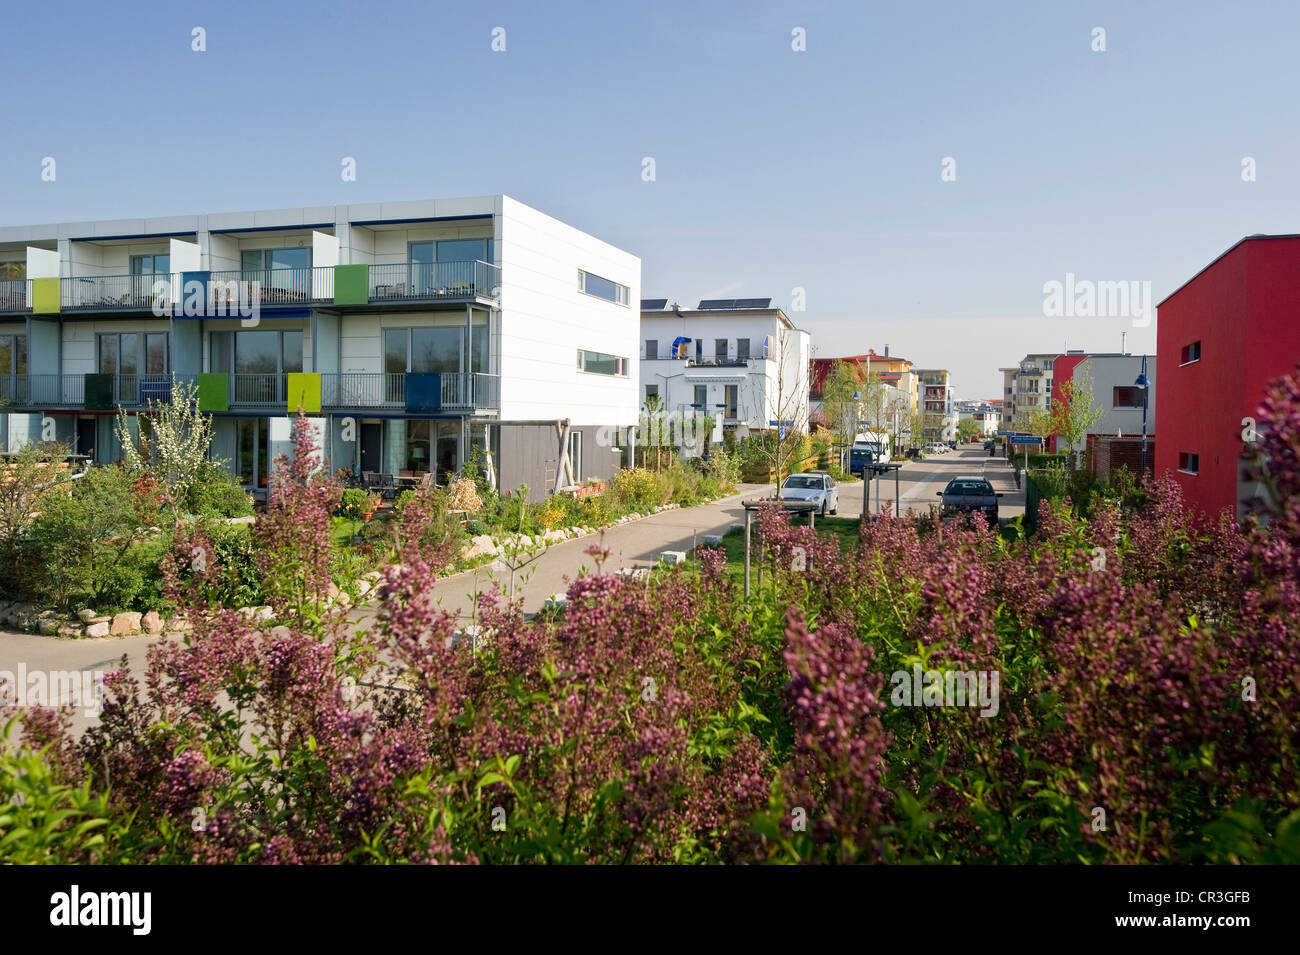 Passive houses, Rieselfeld district, Freiburg im Breisgau, Baden-Wuerttemberg, Germany, Europe - Stock Image